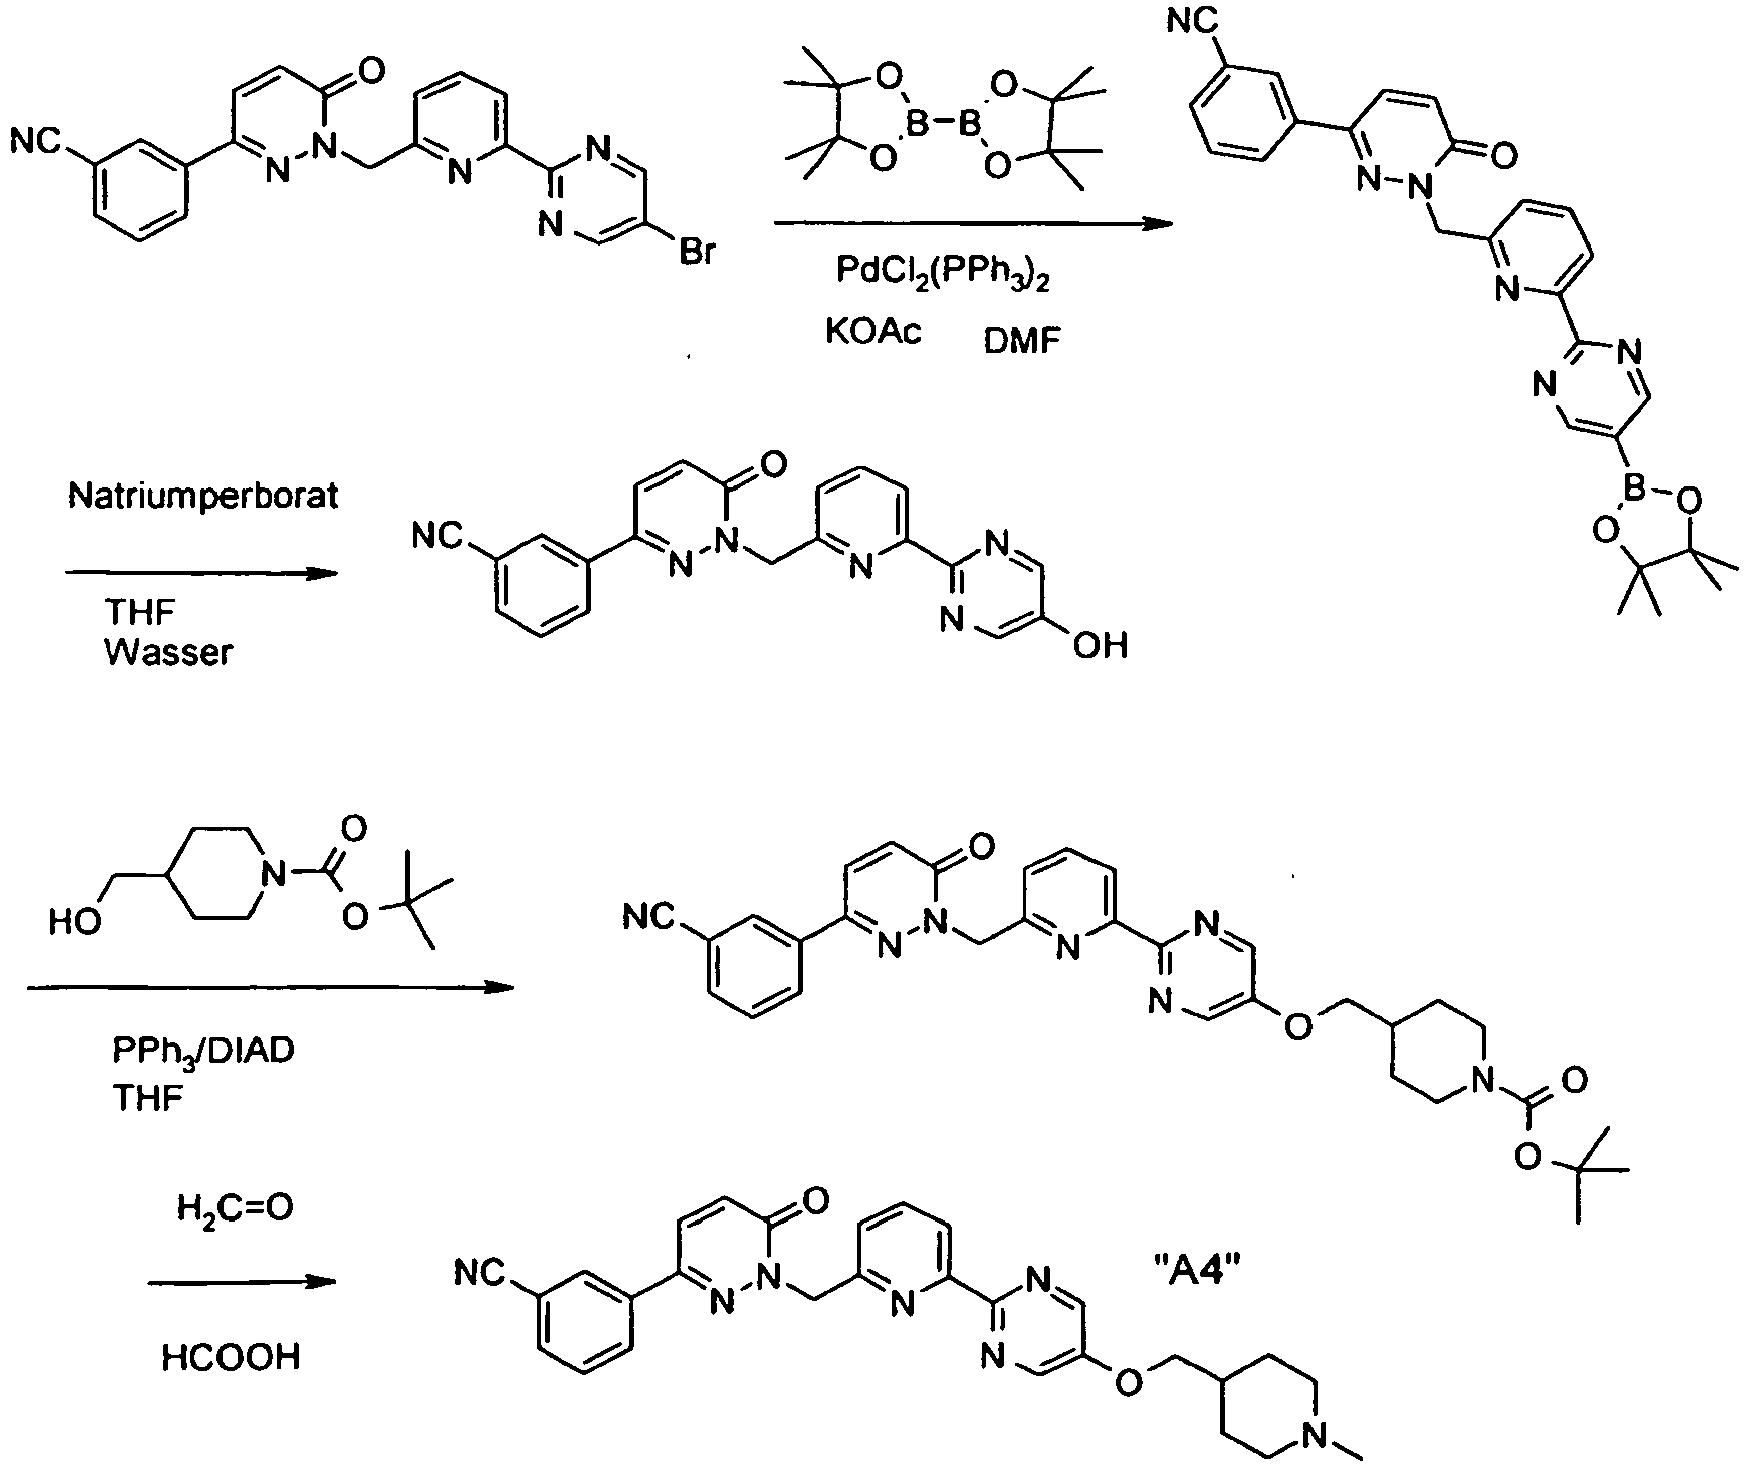 EP2280962B1 - Pyridazinone derivatives - Google Patents